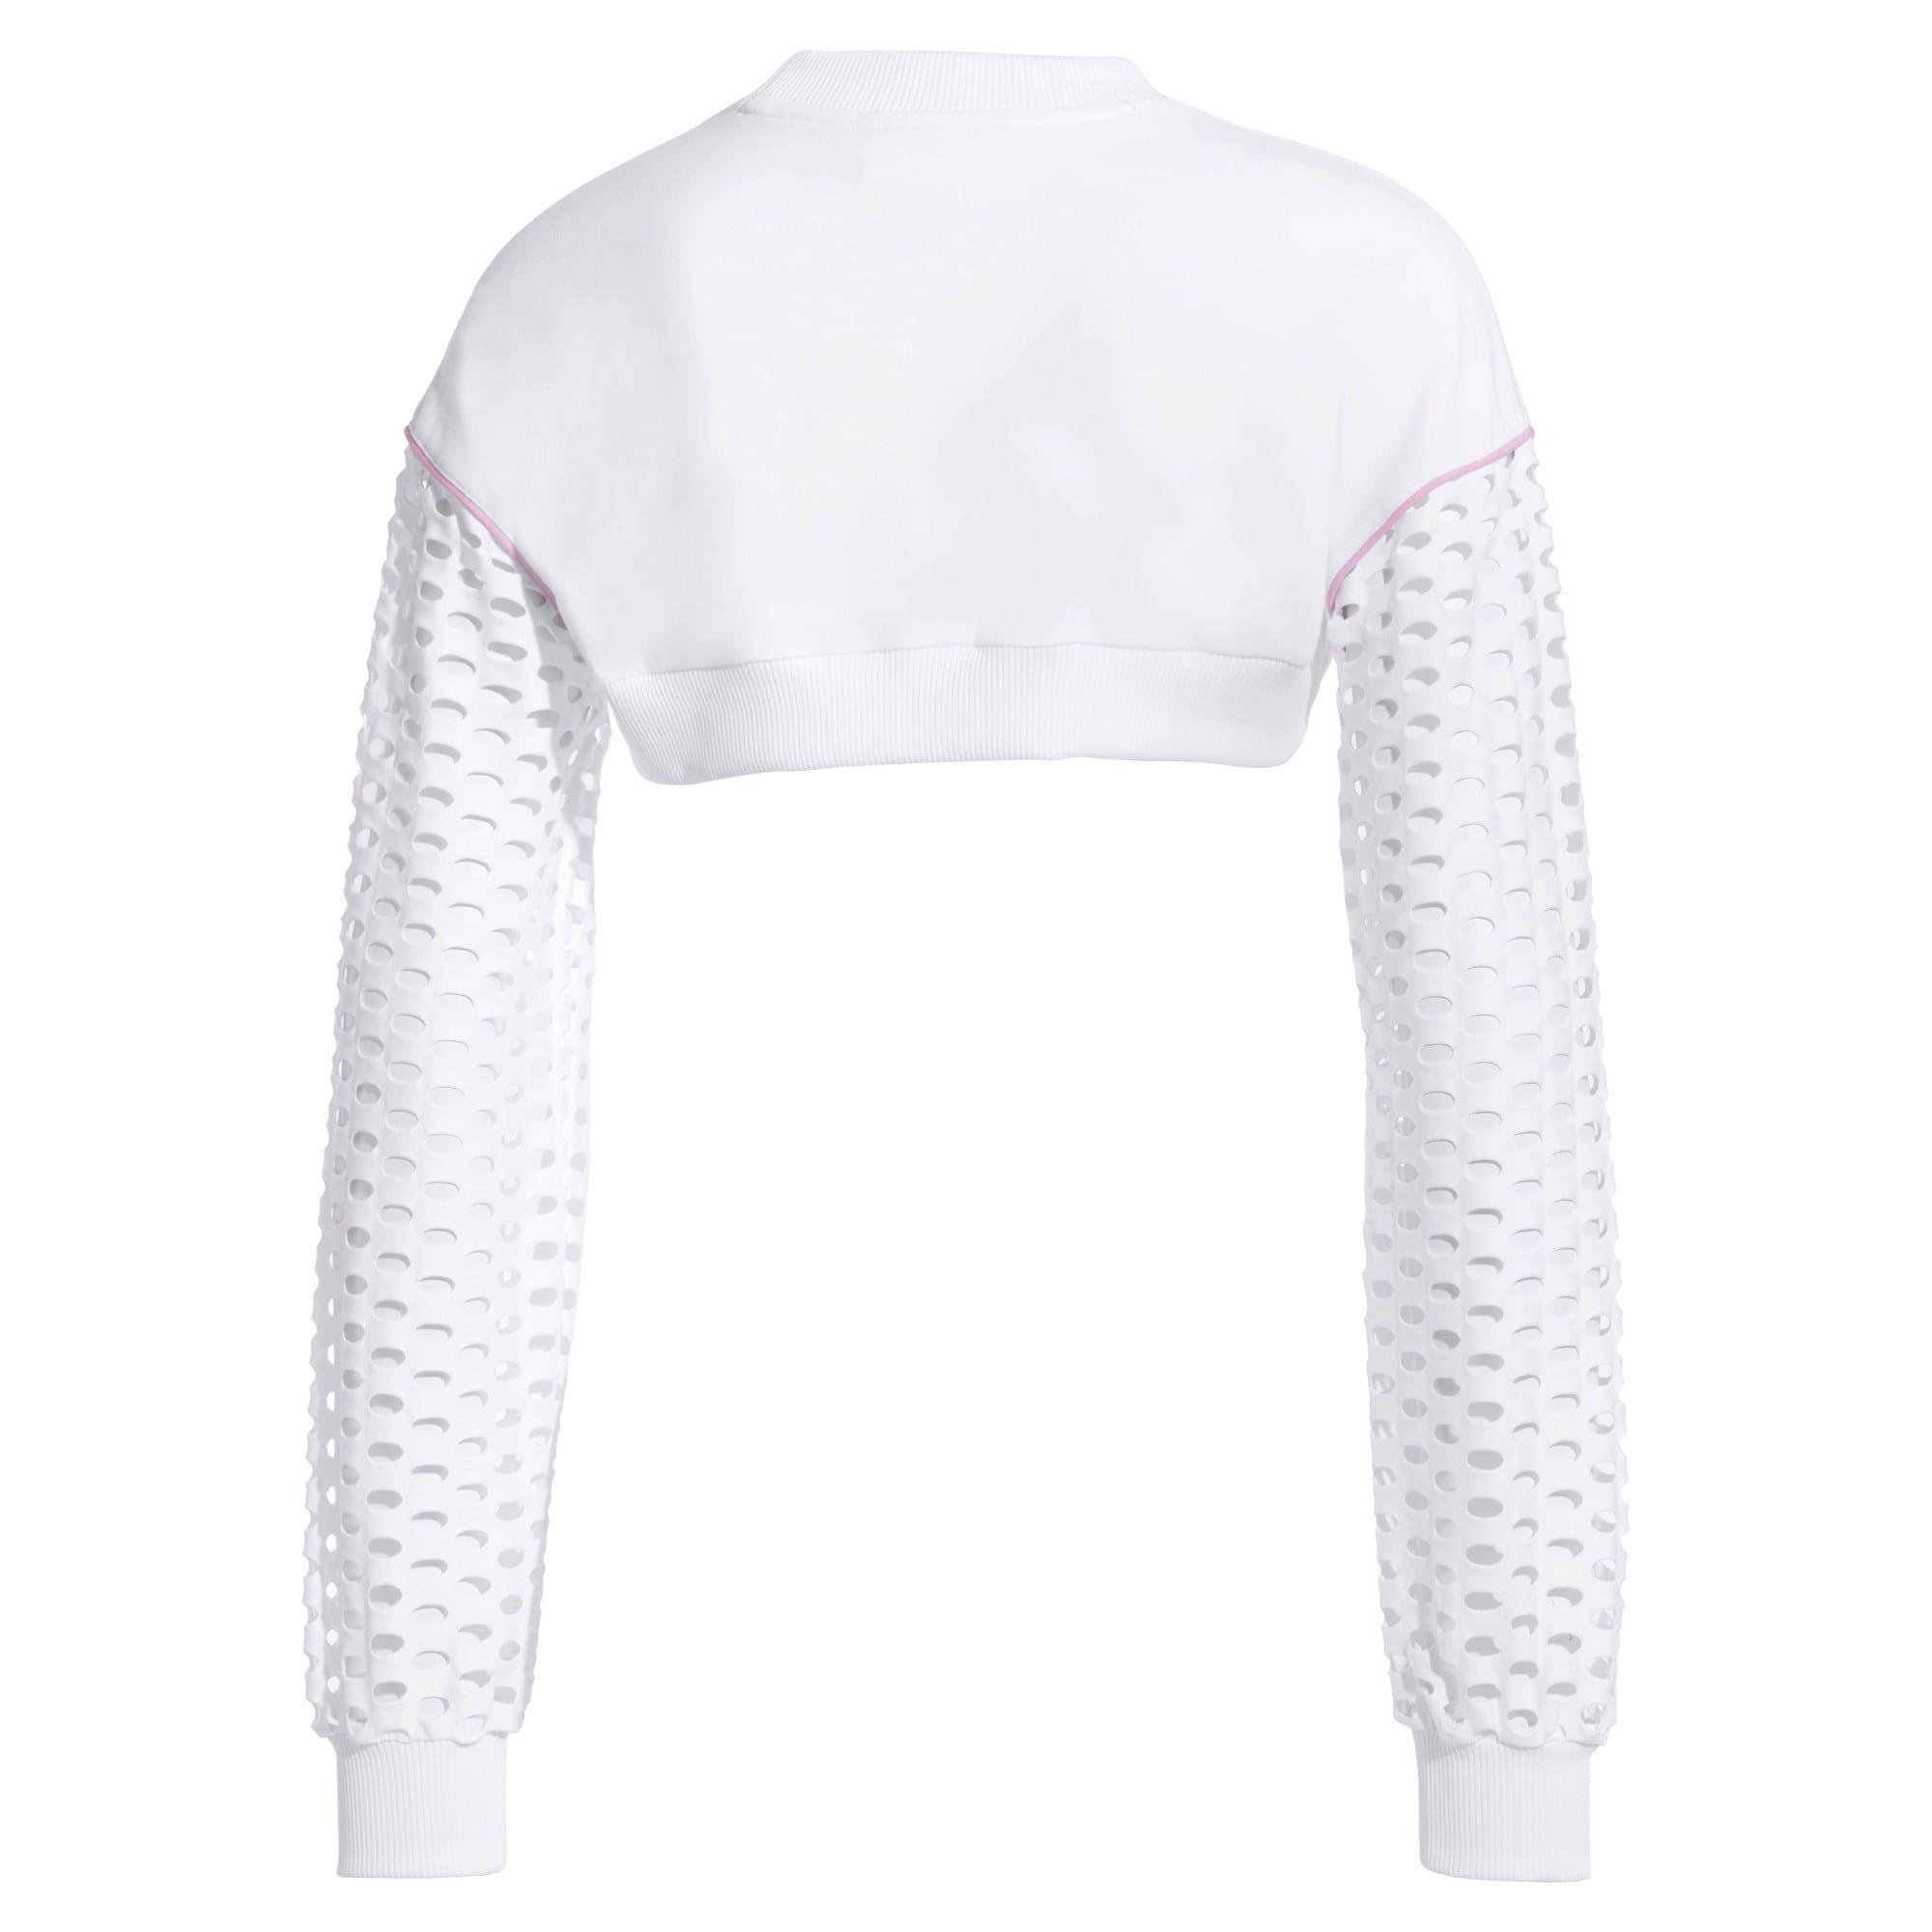 Thumbnail 5 of PUMA x SOPHIA WEBSTER Women's Cropped Crewneck Sweatshirt, Puma White, medium